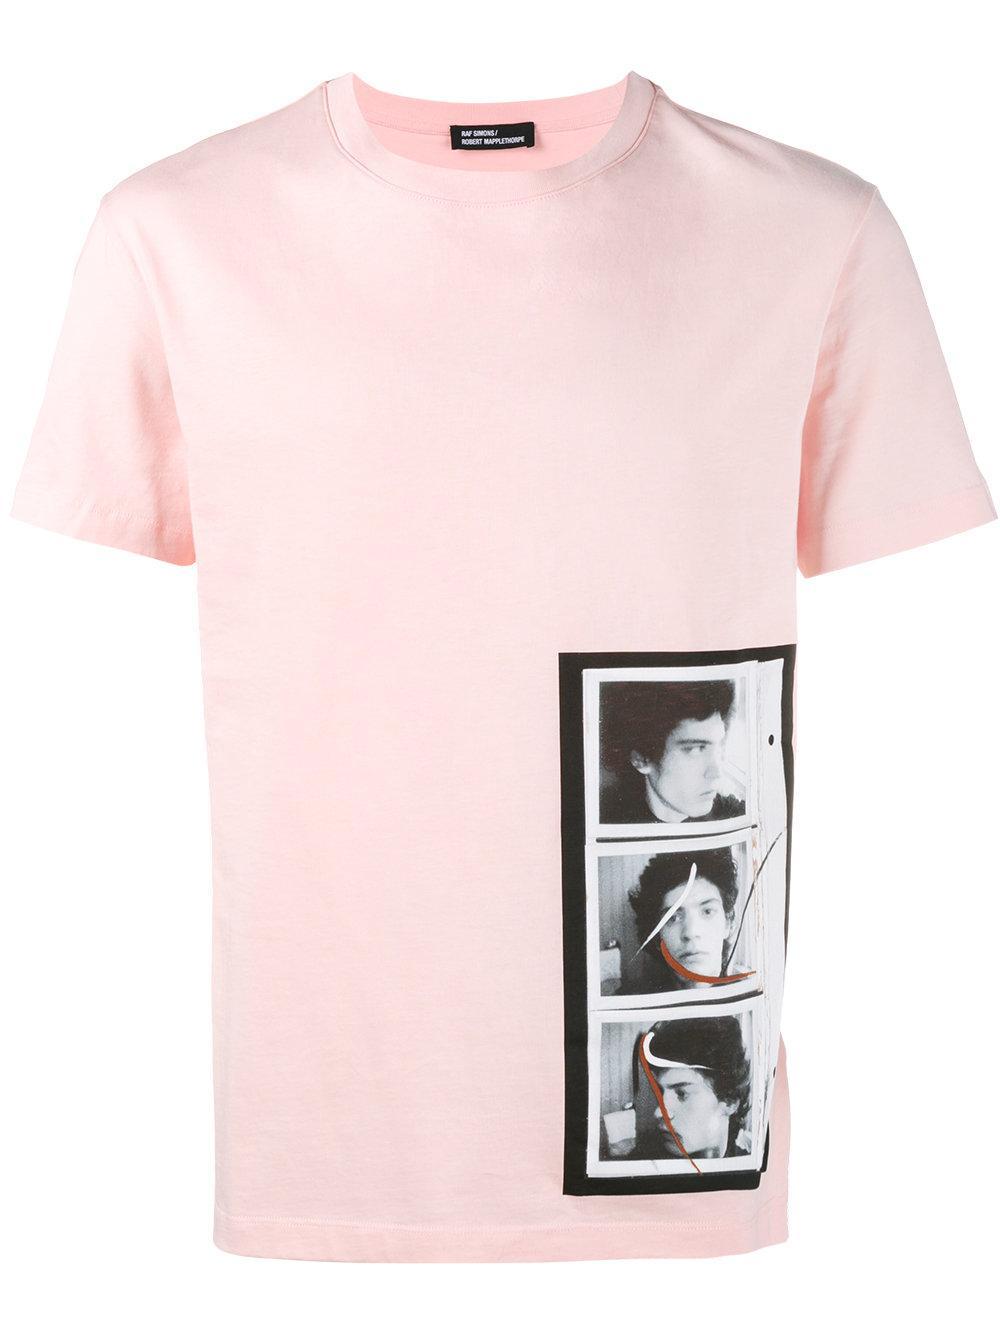 Raf simons x robert mapplethorpe triptych print t shirt for Raf simons robert mapplethorpe shirt